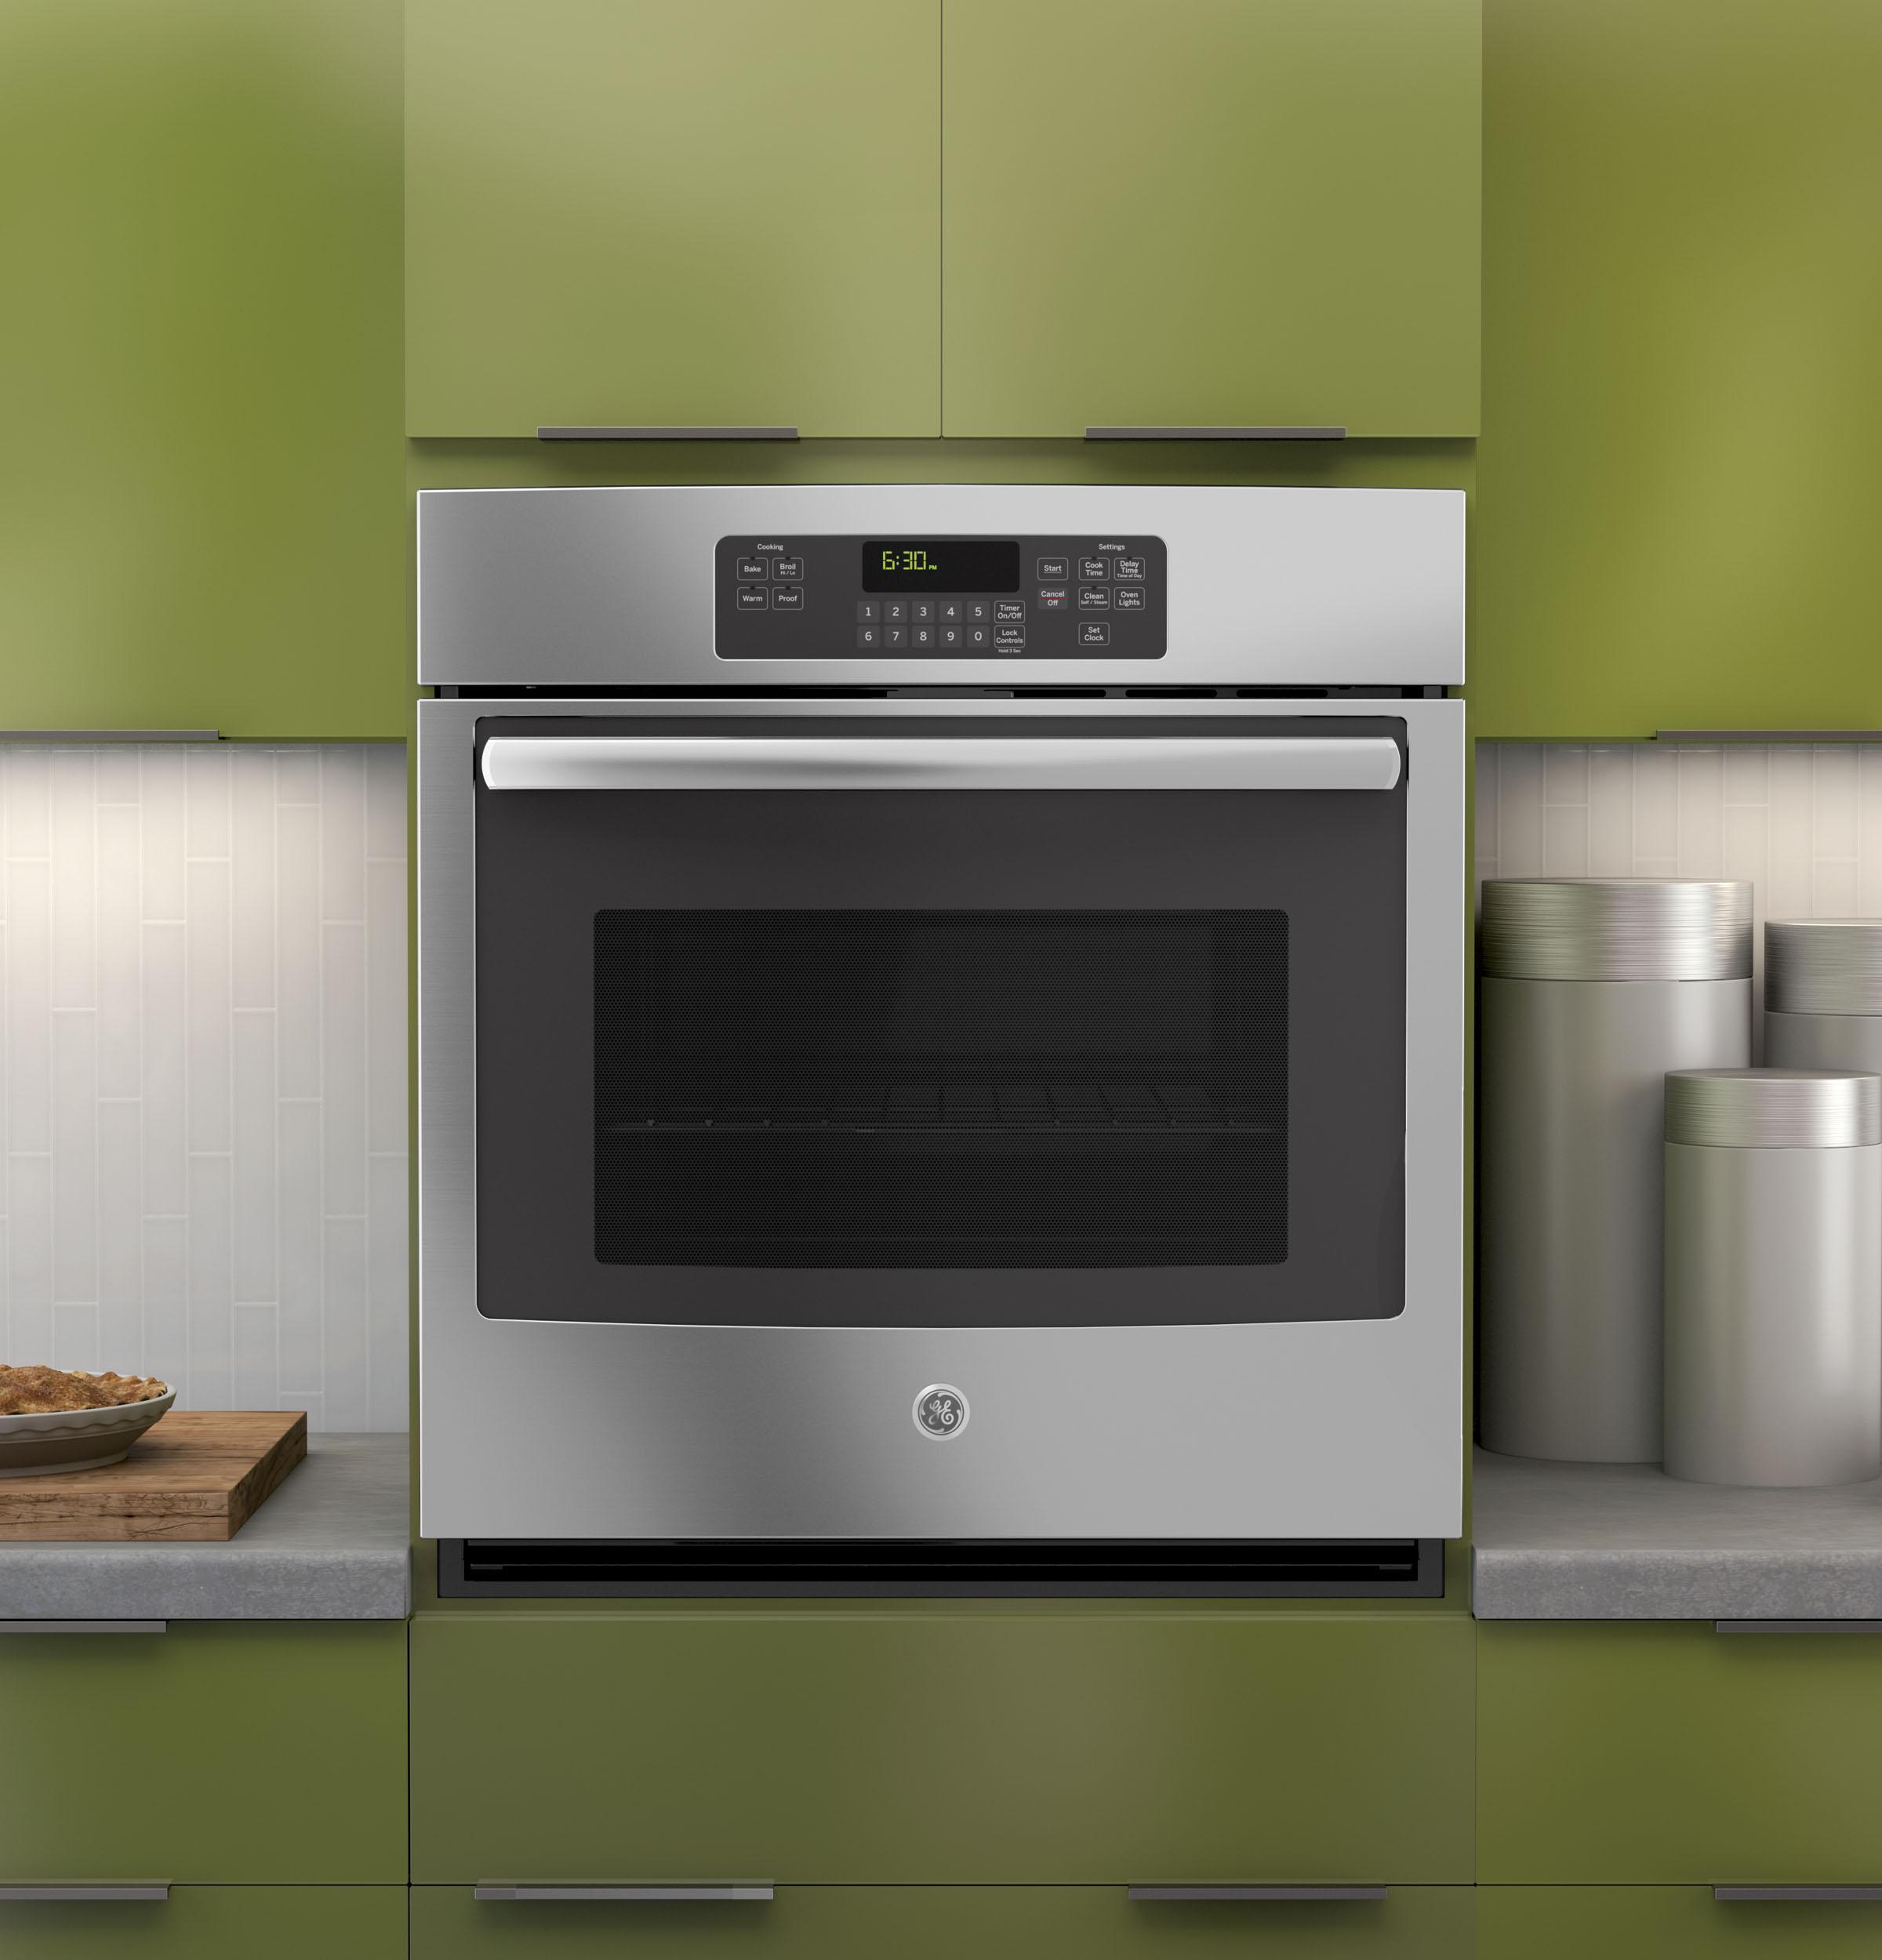 Jk3000 General Electric Jk3000 Single Wall Ovens